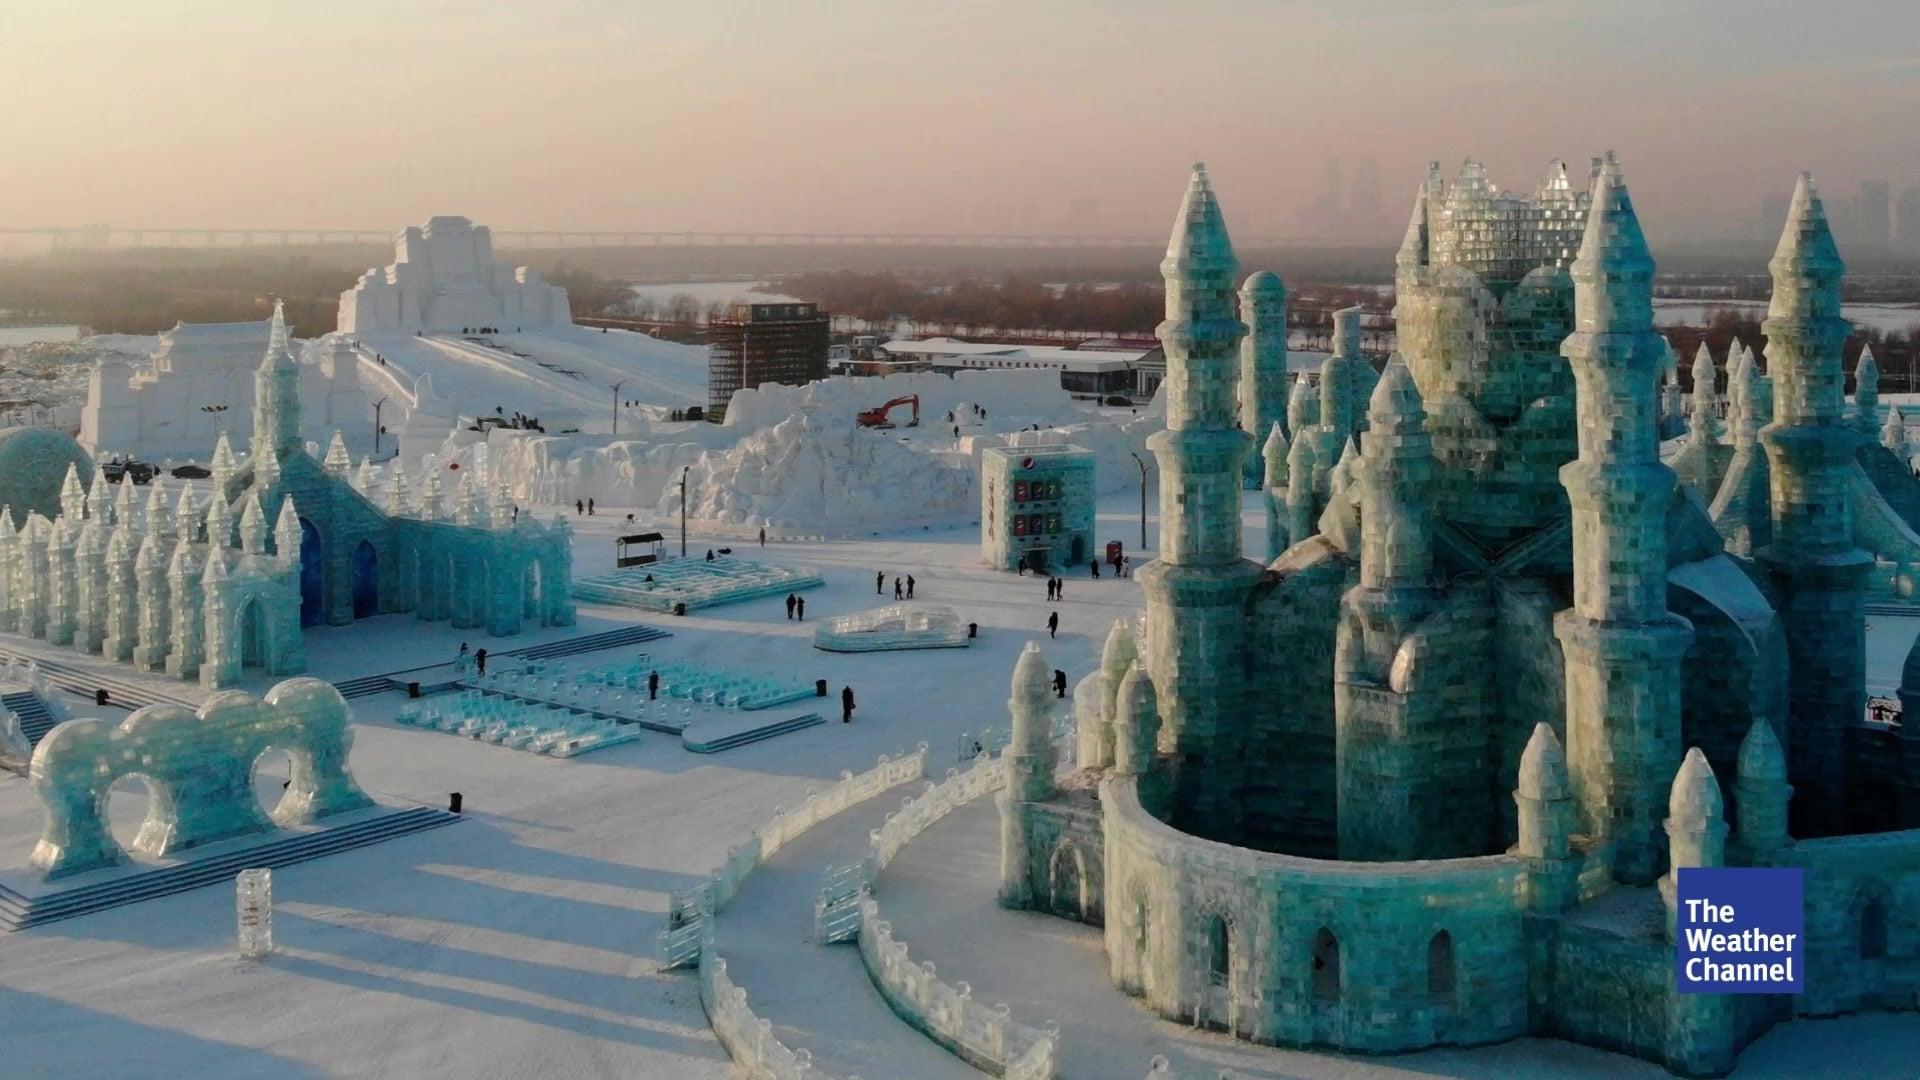 Winterfestival in China: Künstler erschaffen Stadt aus Eis